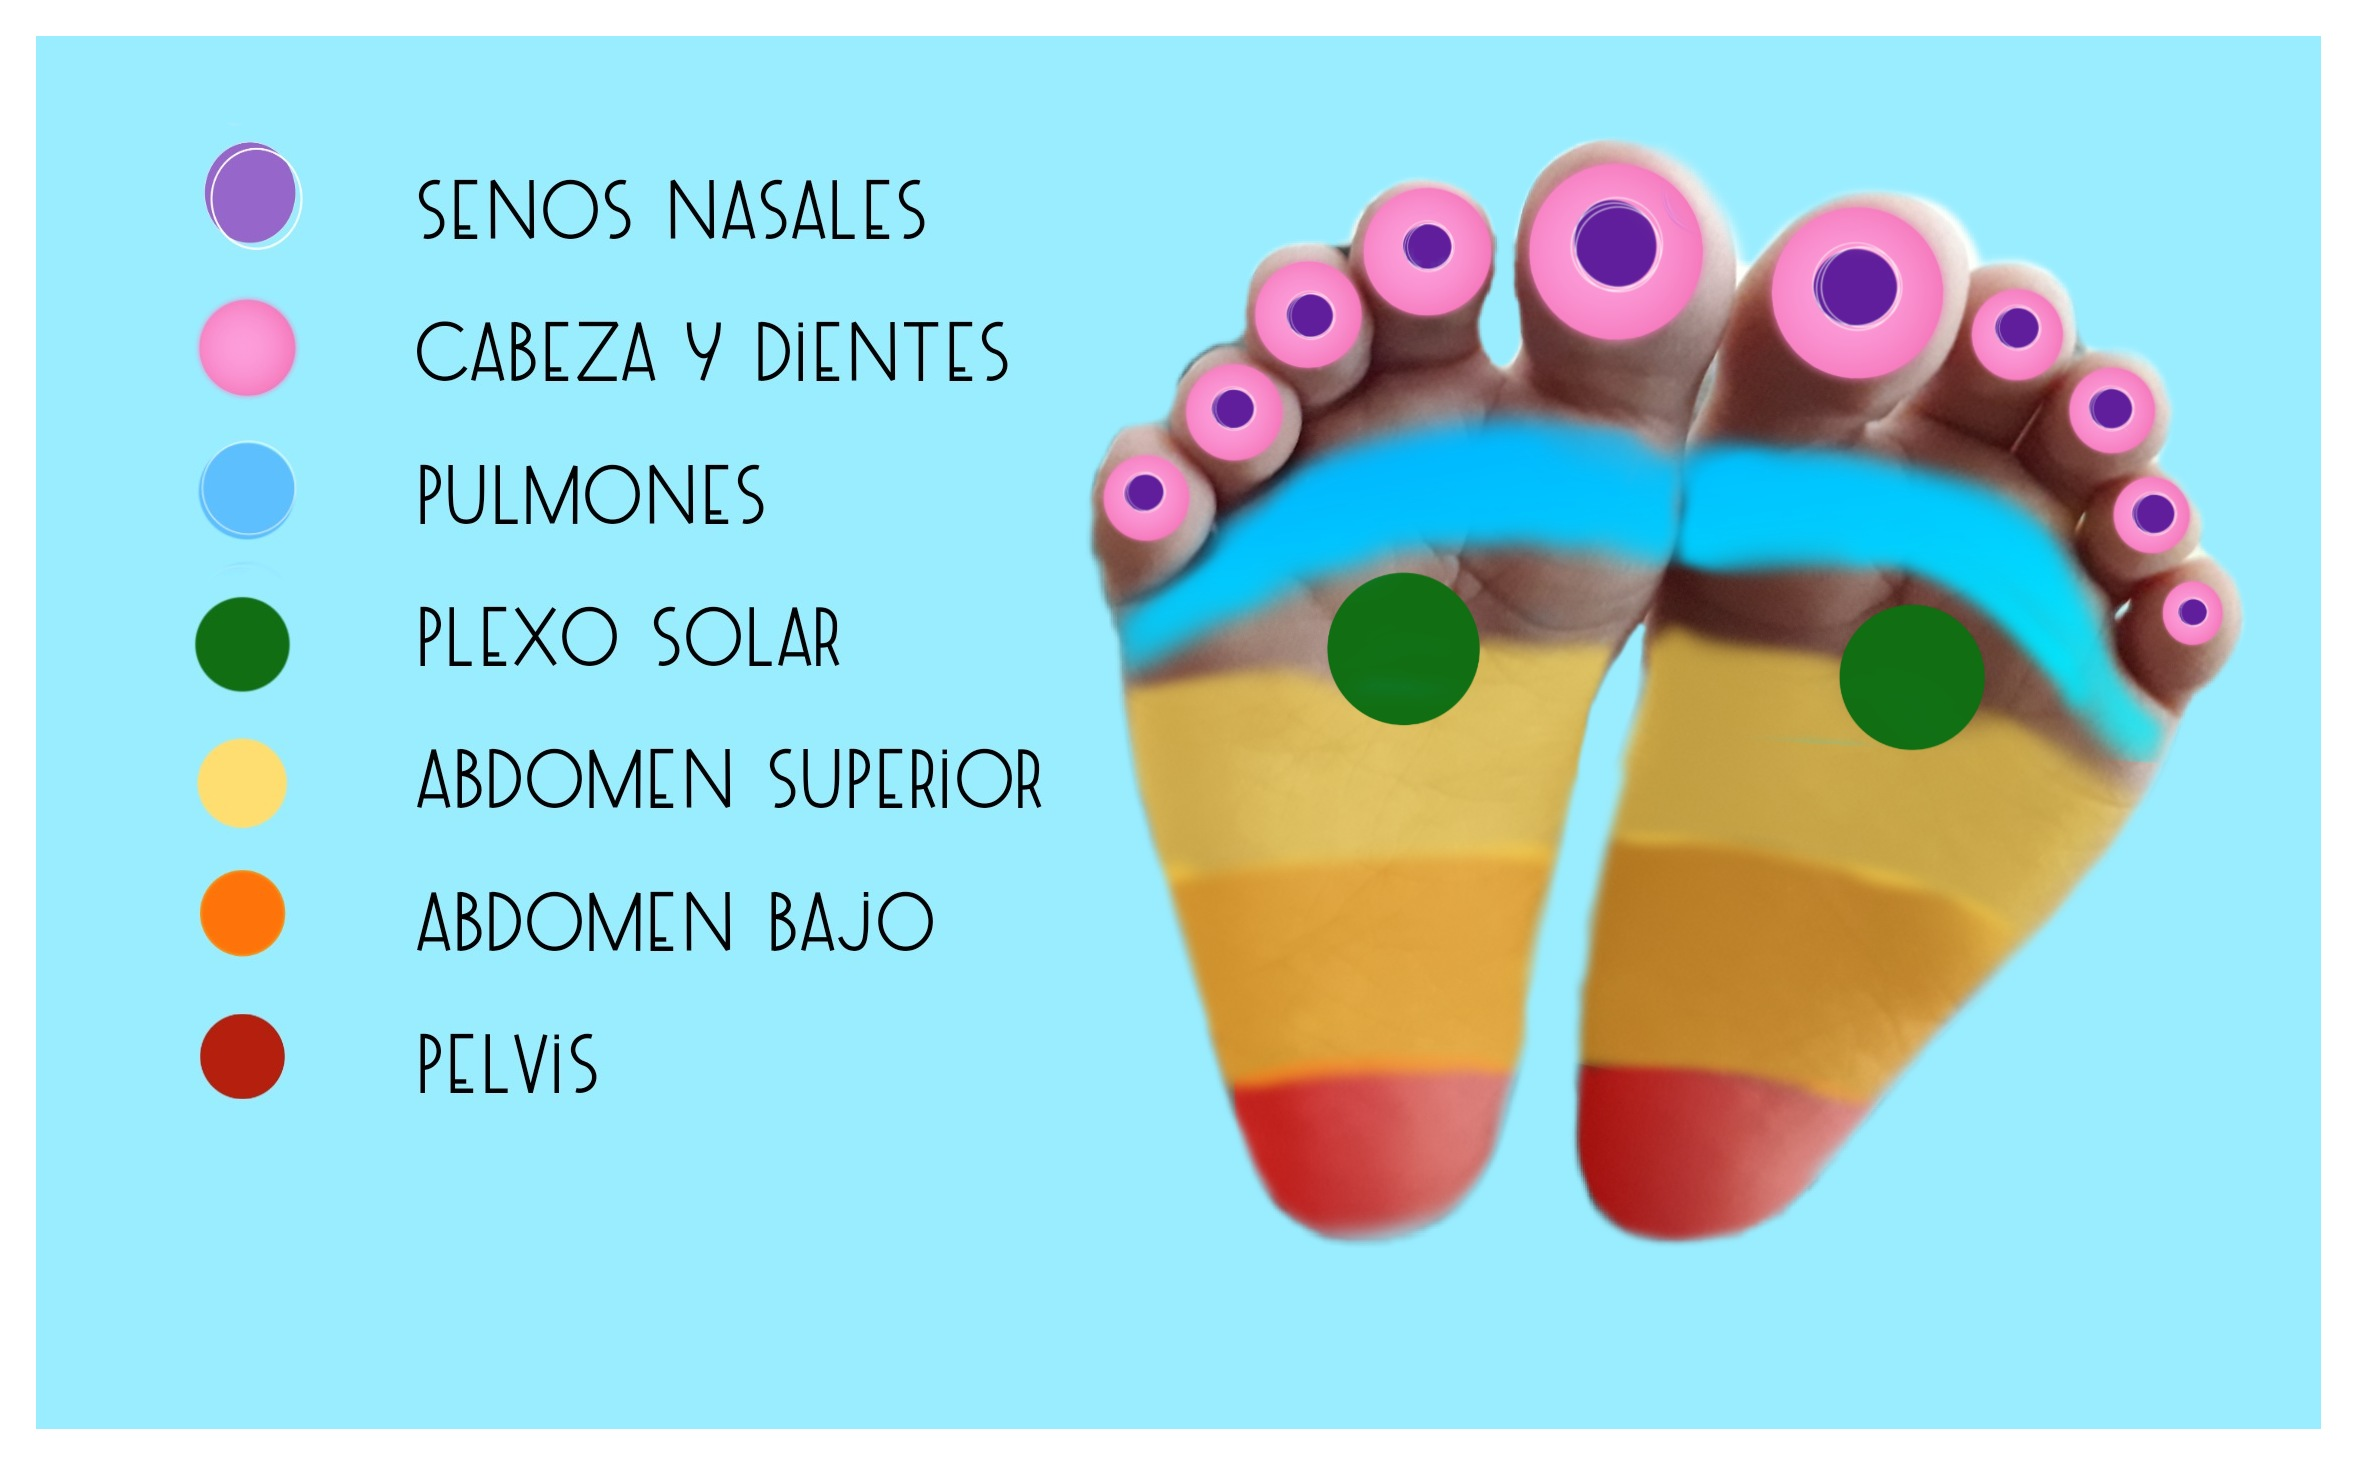 imagen zonas de reflexoterapia podal infantil